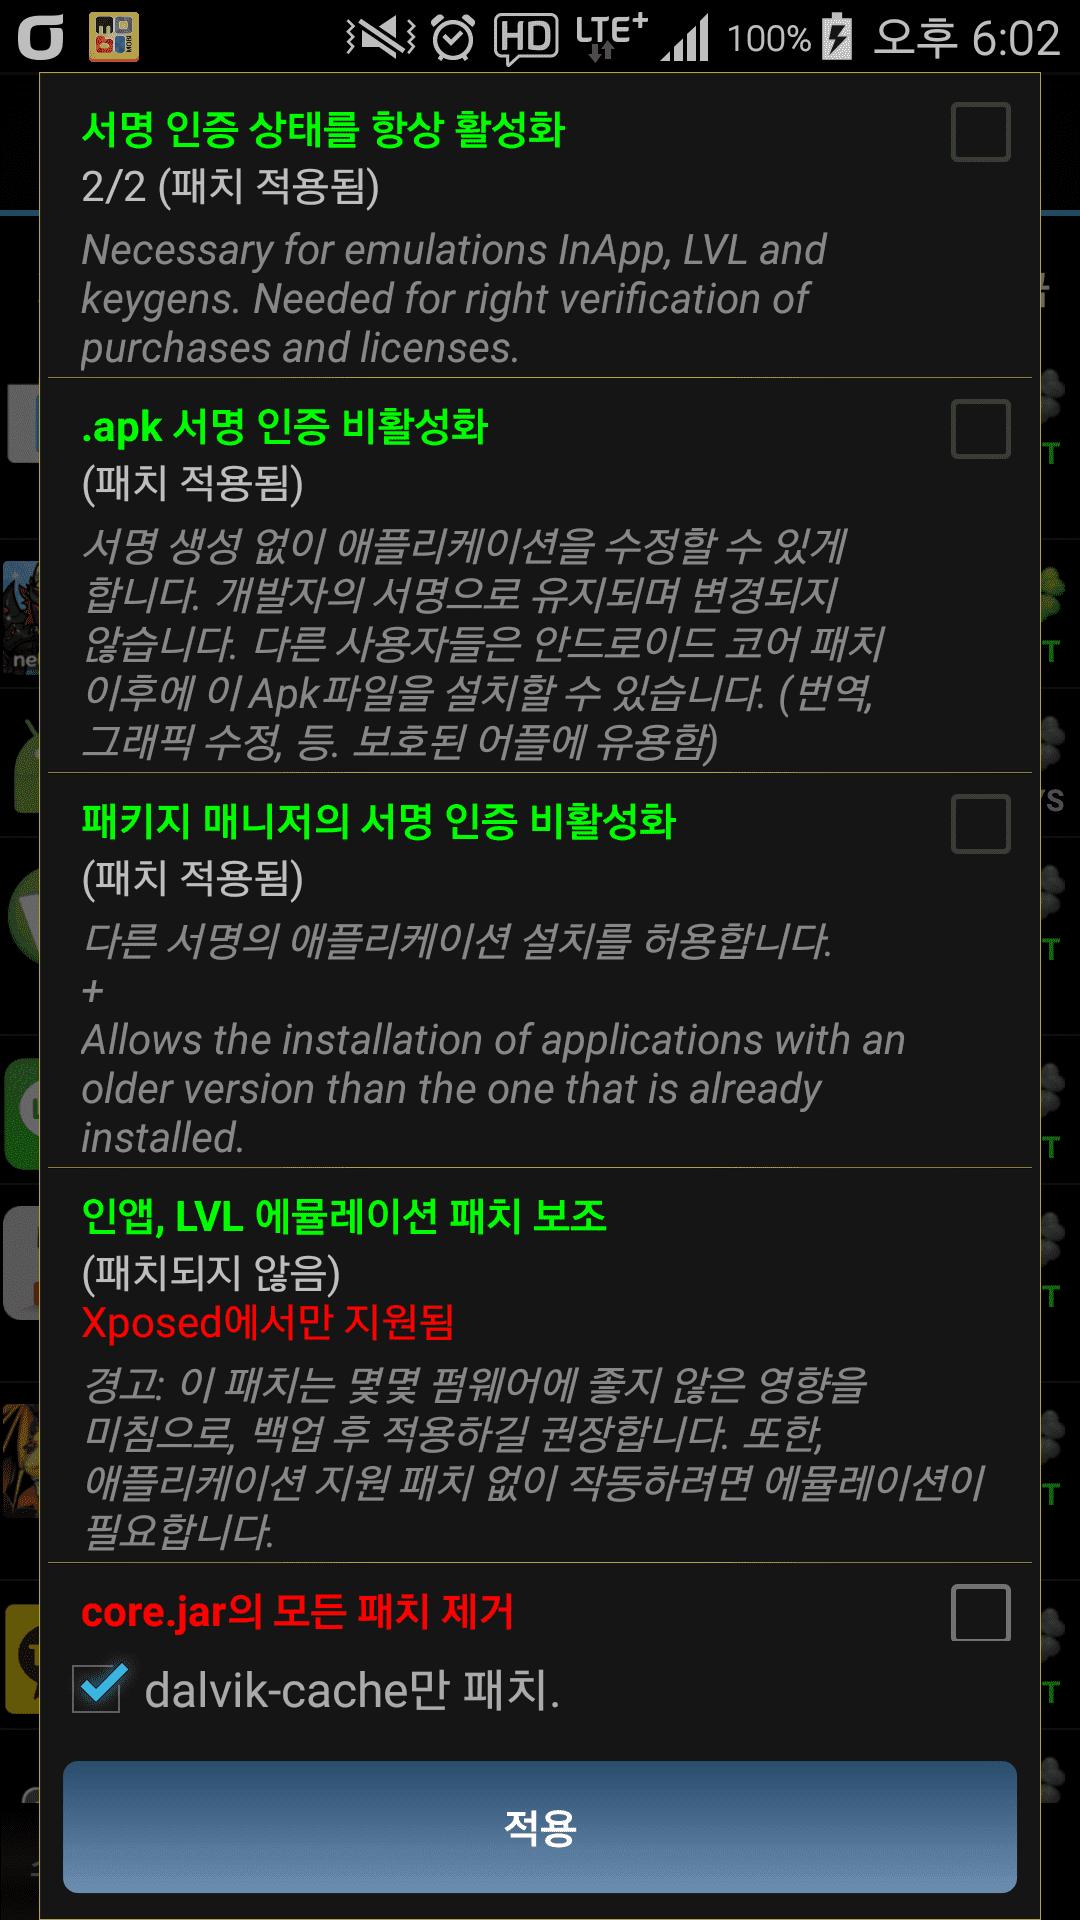 Screenshot_2016-08-31-18-02-54.png